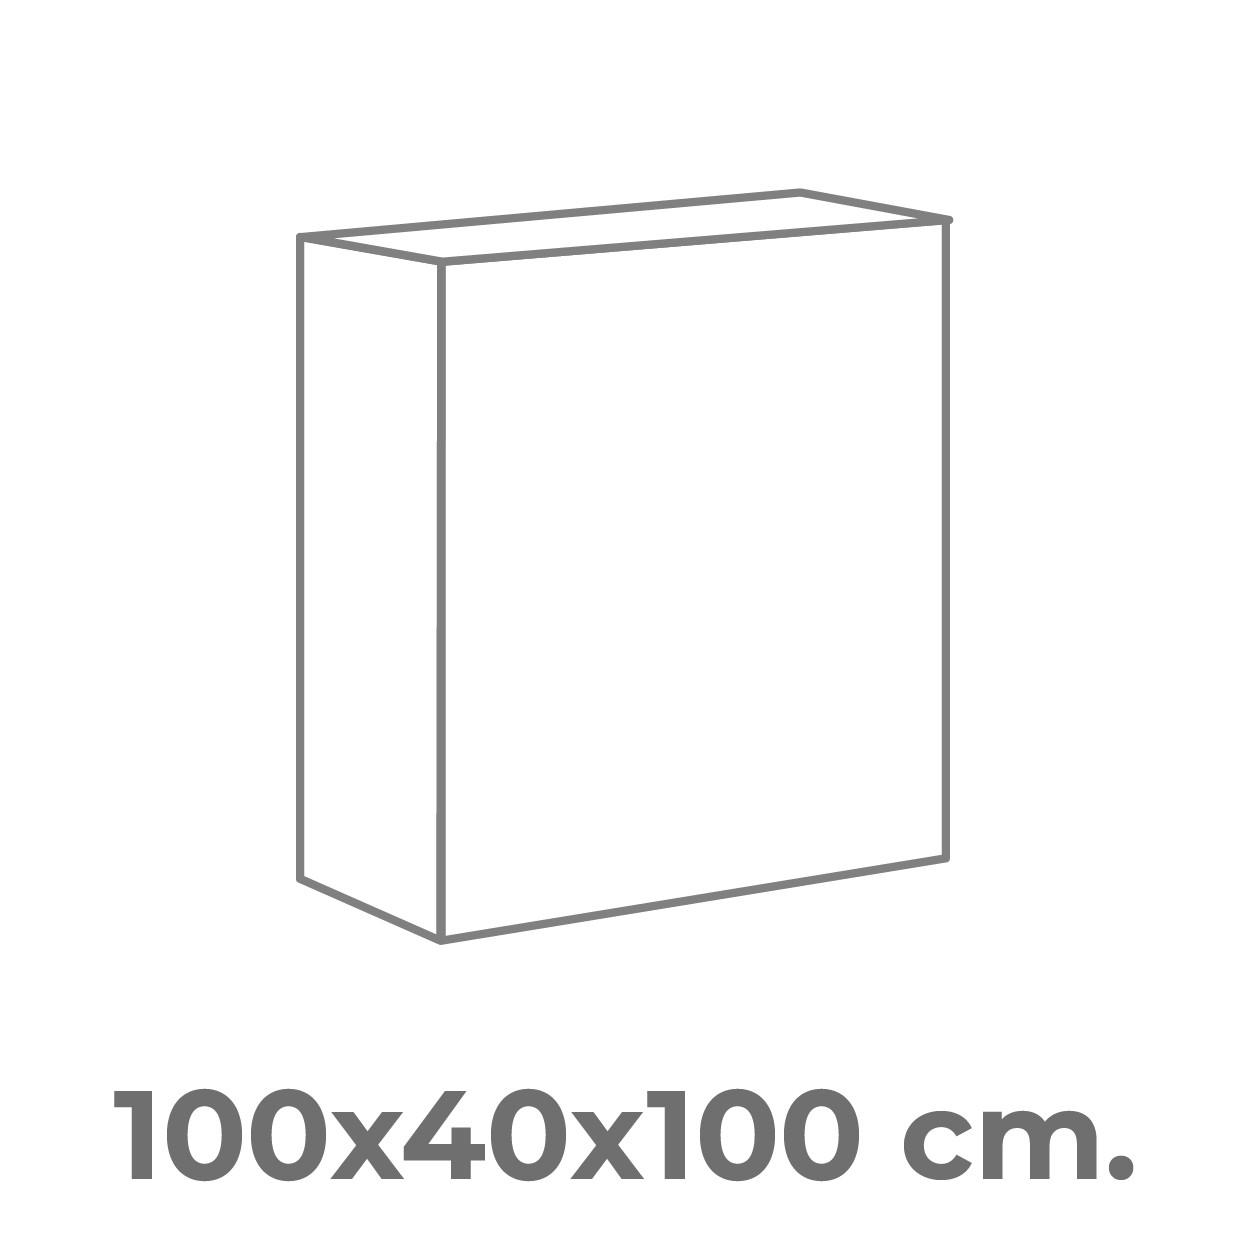 100x100x40 cm.